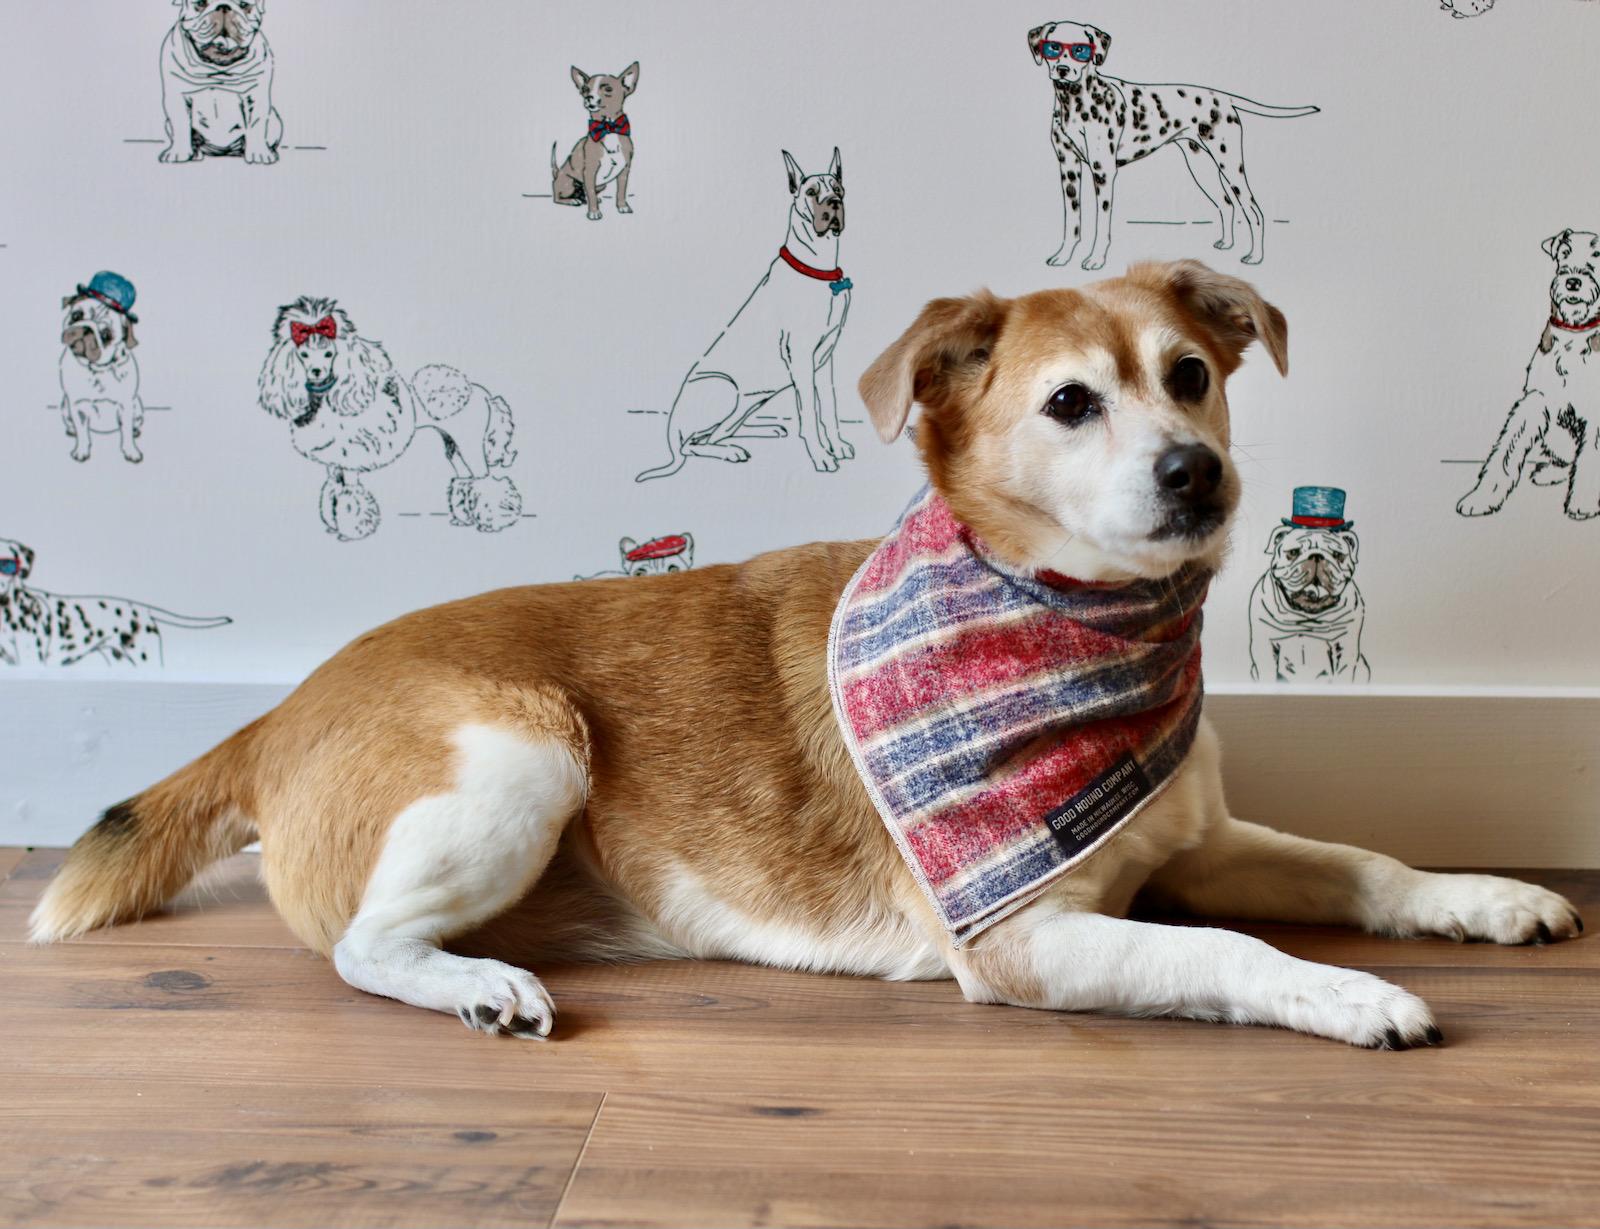 Riley the dog